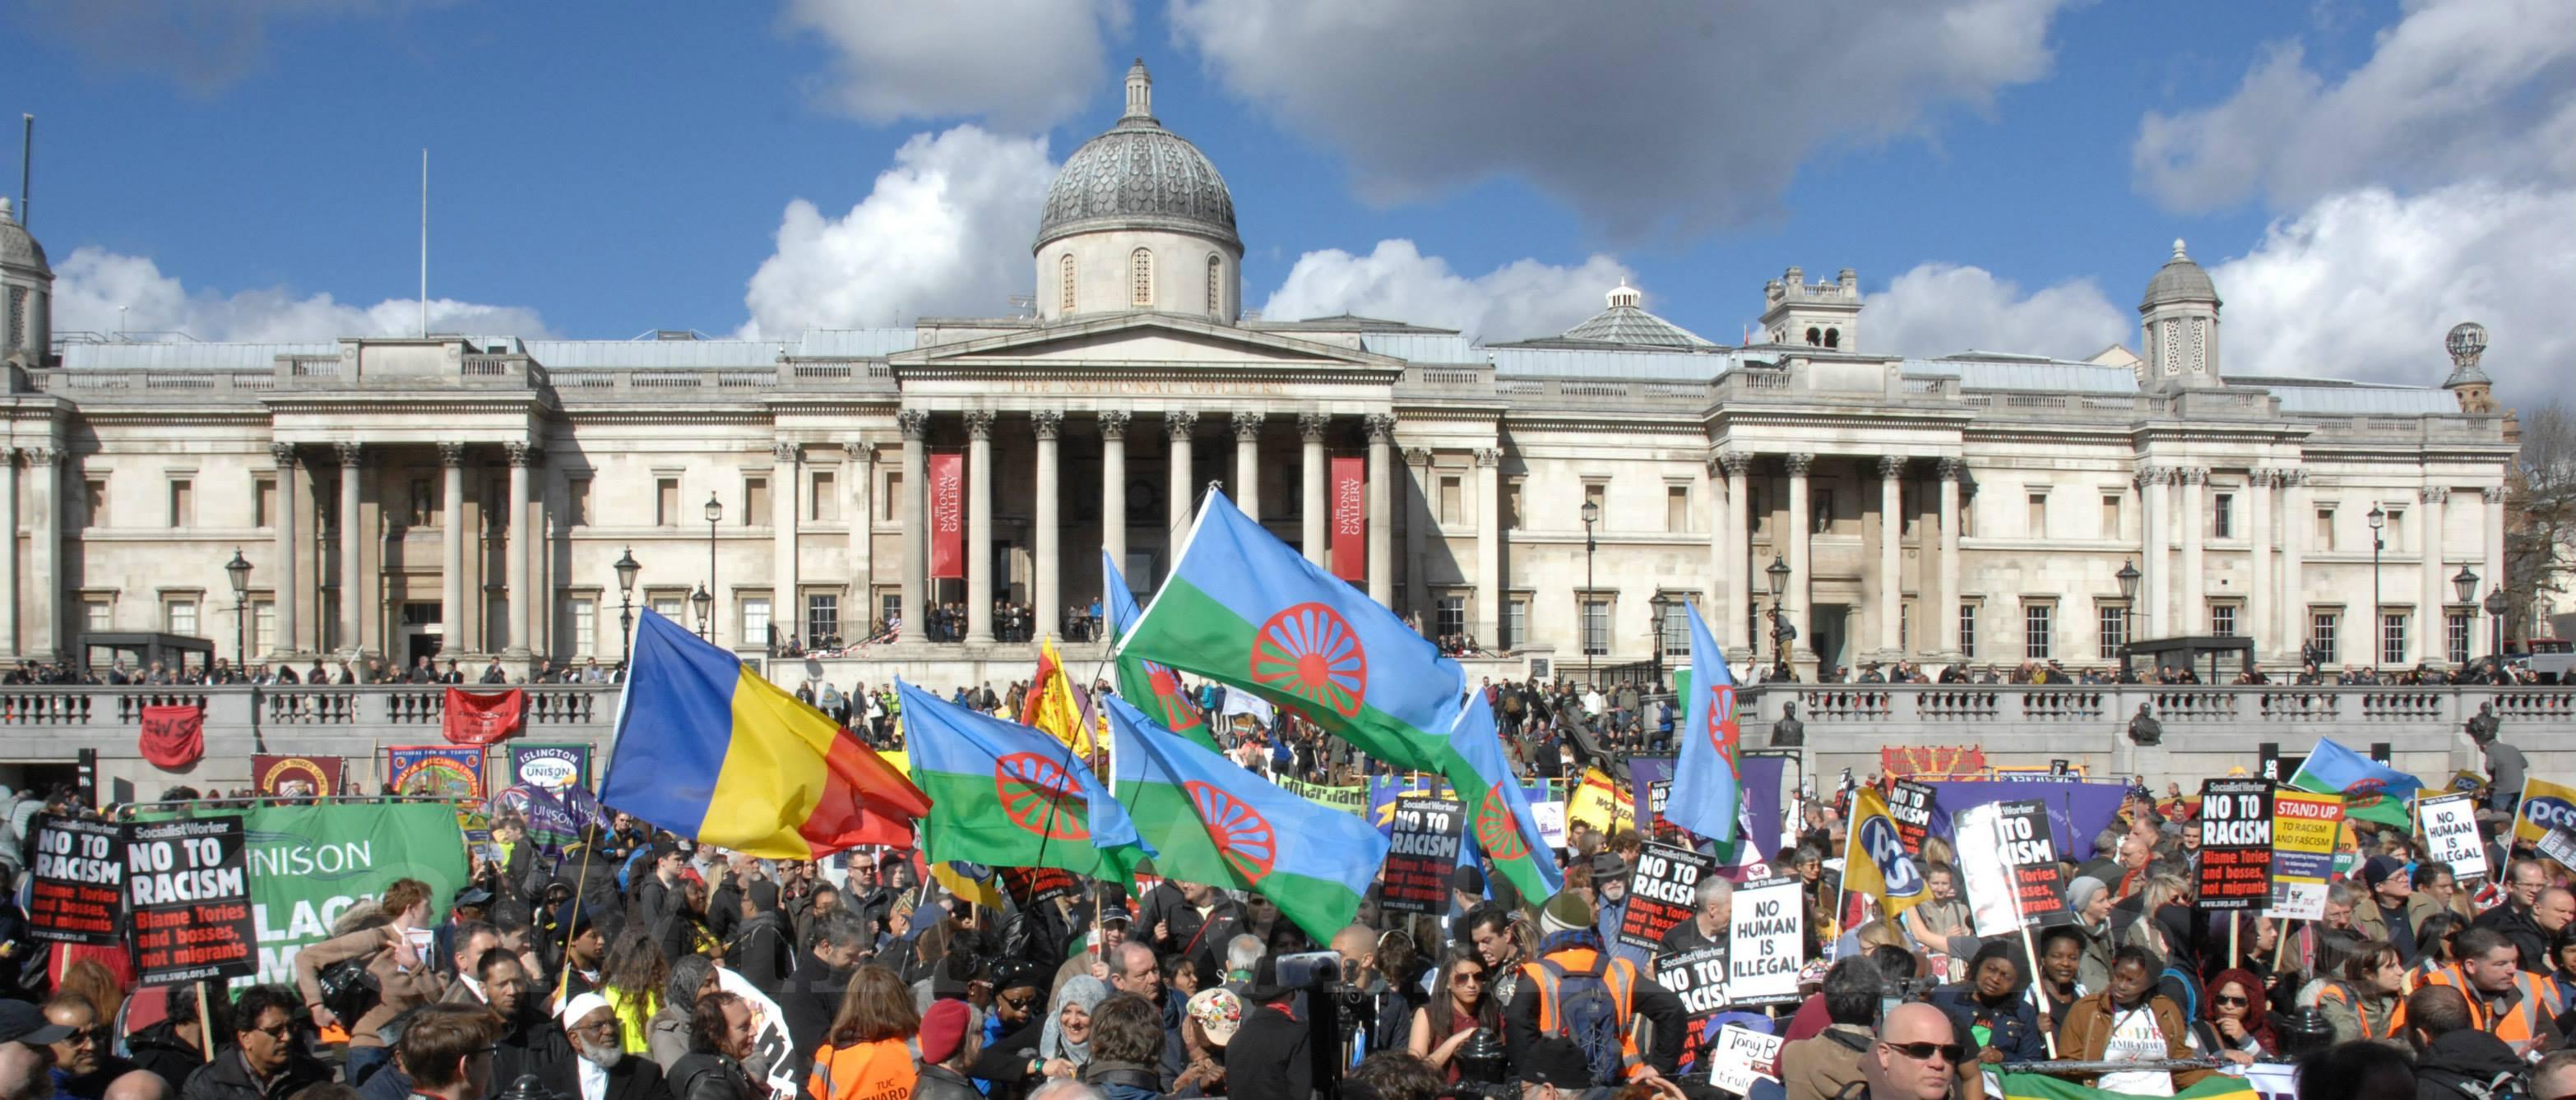 UN Anti-Racism Day London 2014